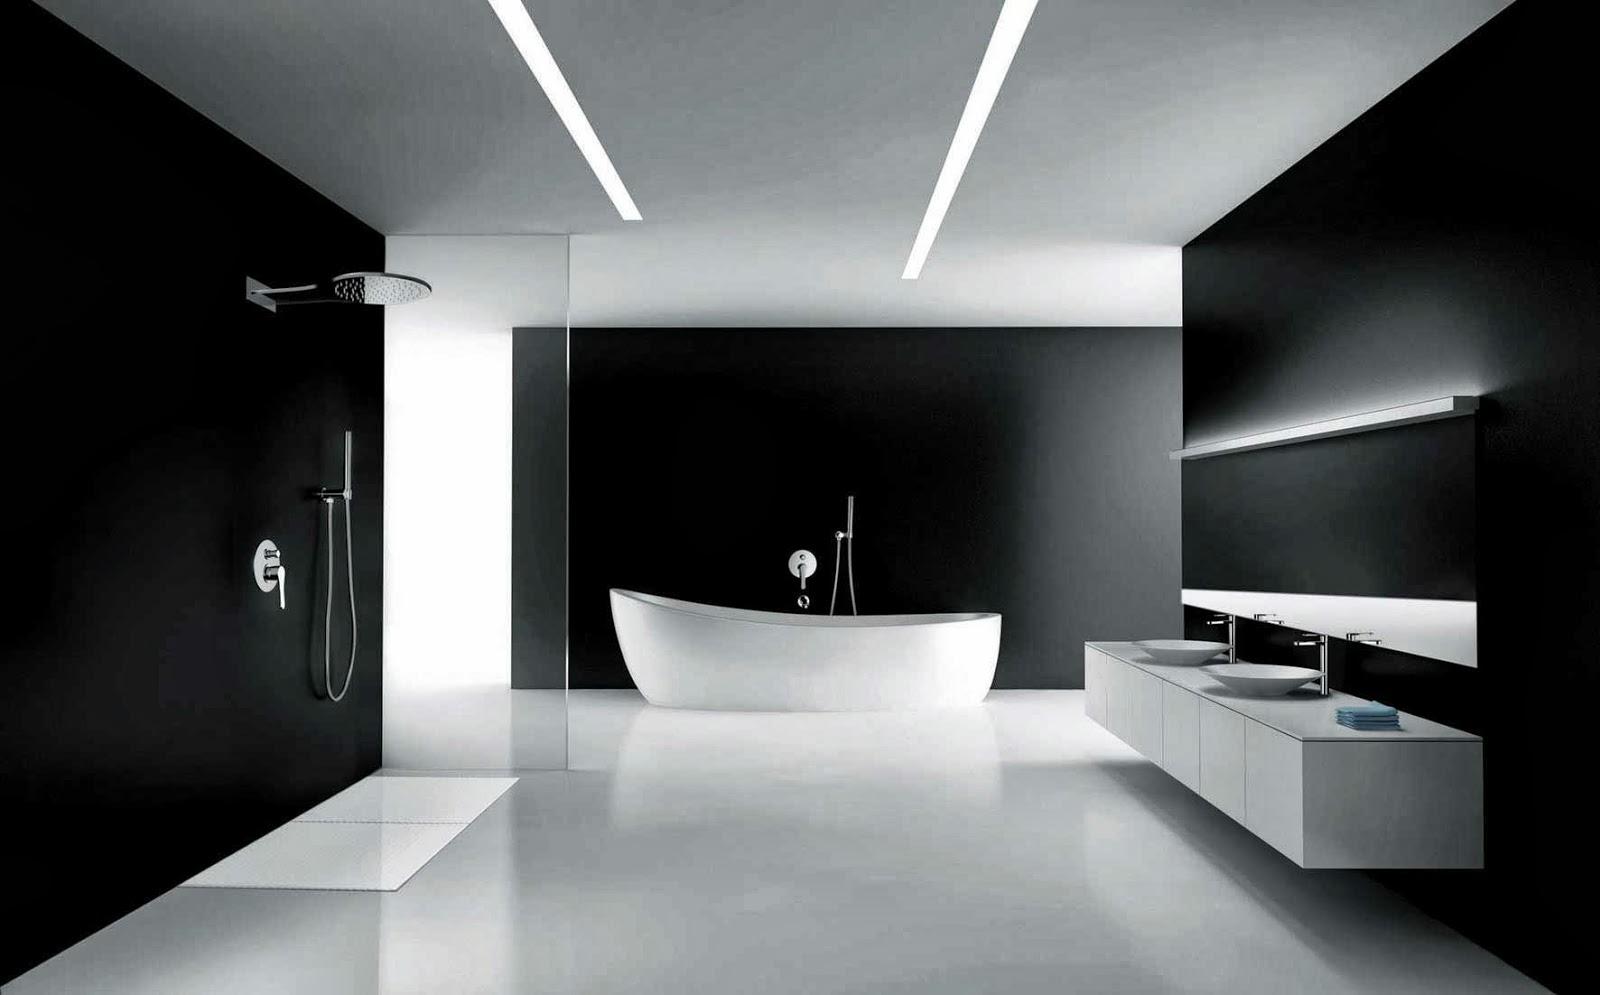 Baño Minimalista Gris:Banos minimalistas8